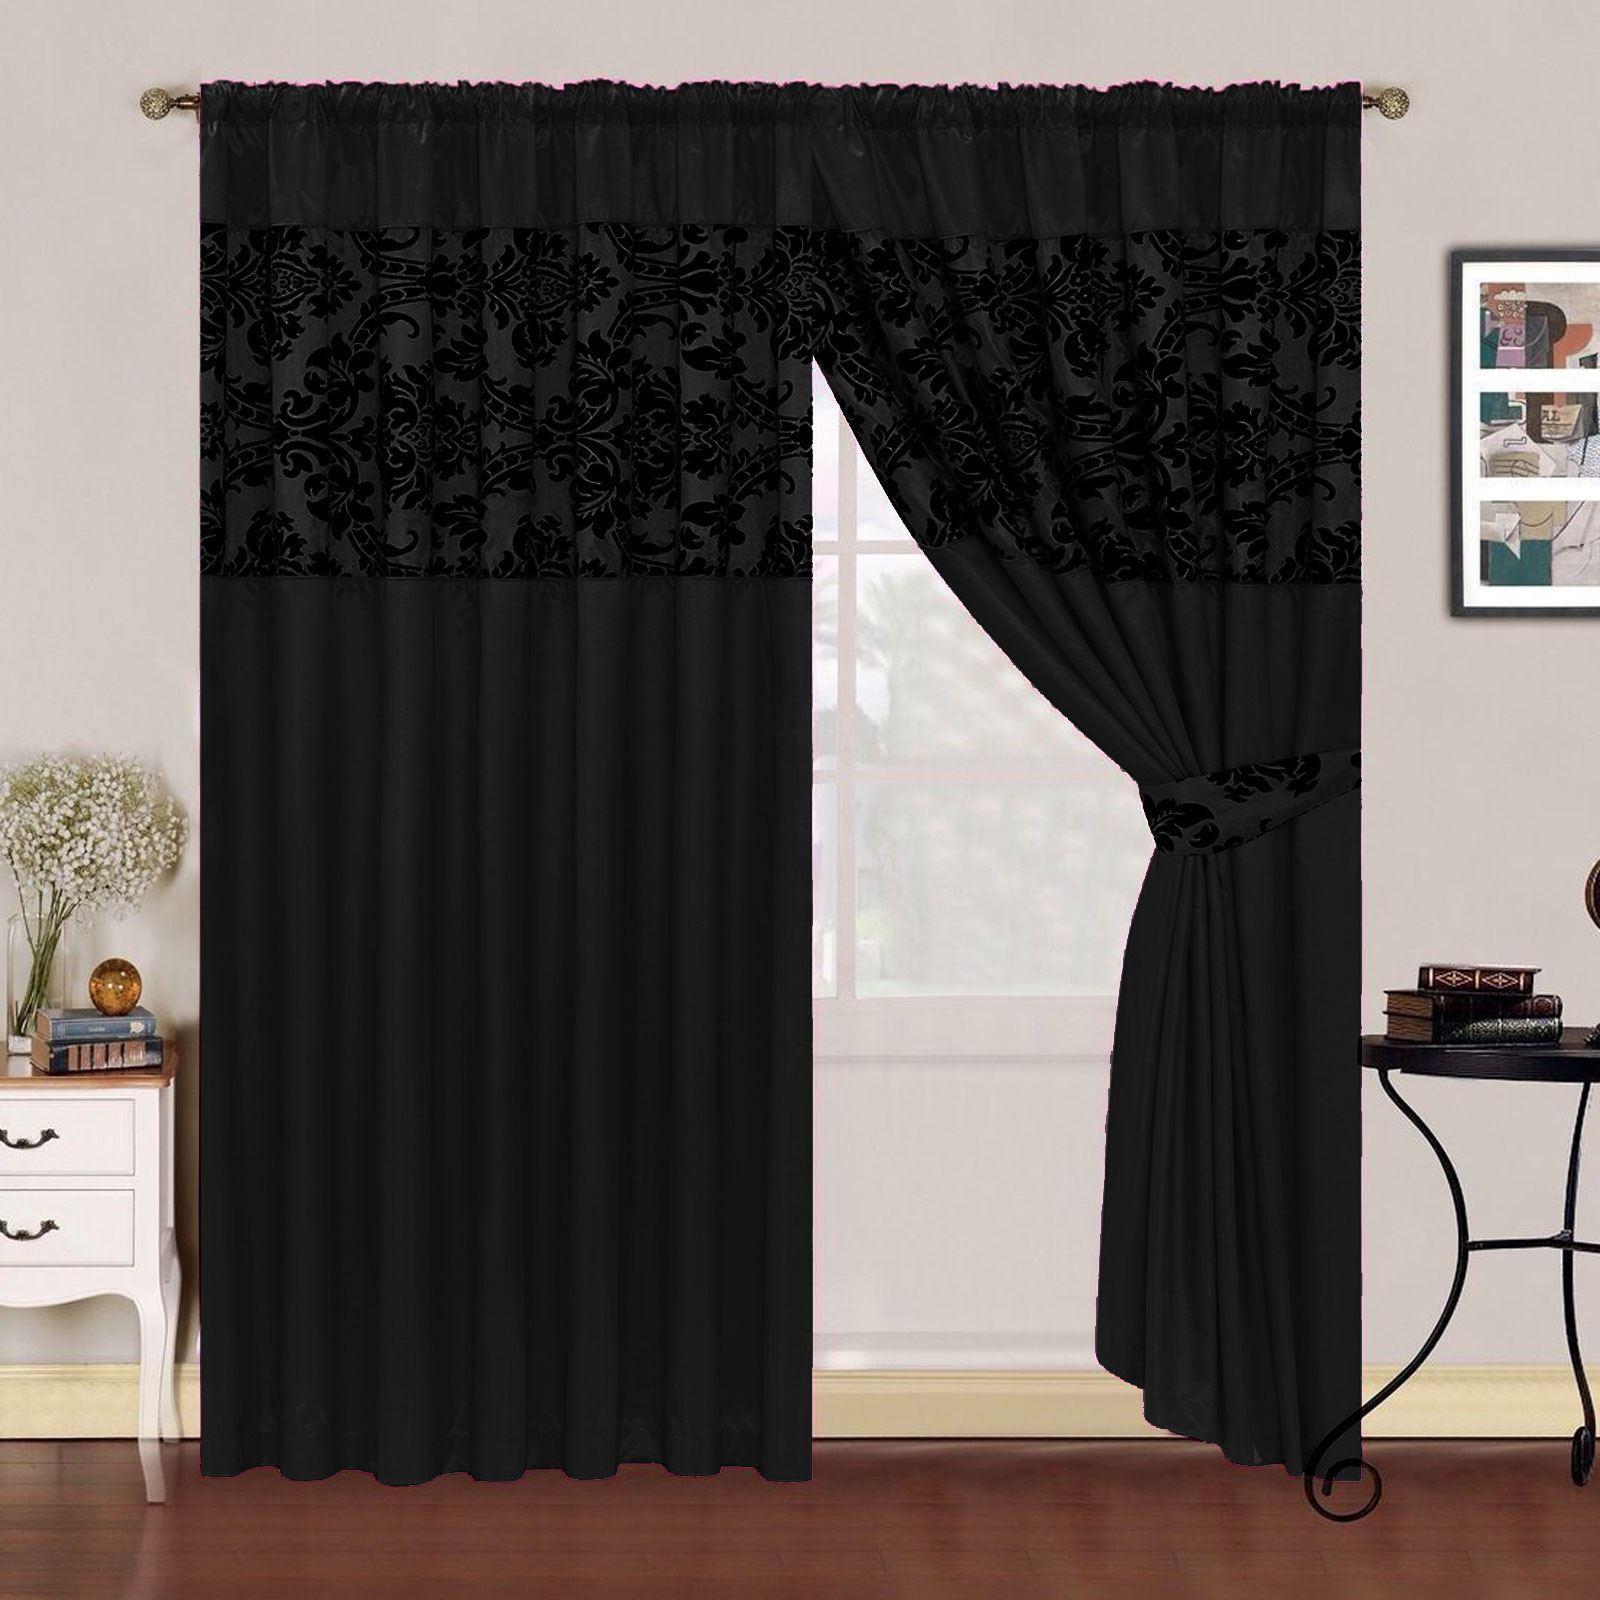 Luxury Curtains Fully Lined Faux Silk Half Flock Damask Pencil Pleat Tie Backs Ebay